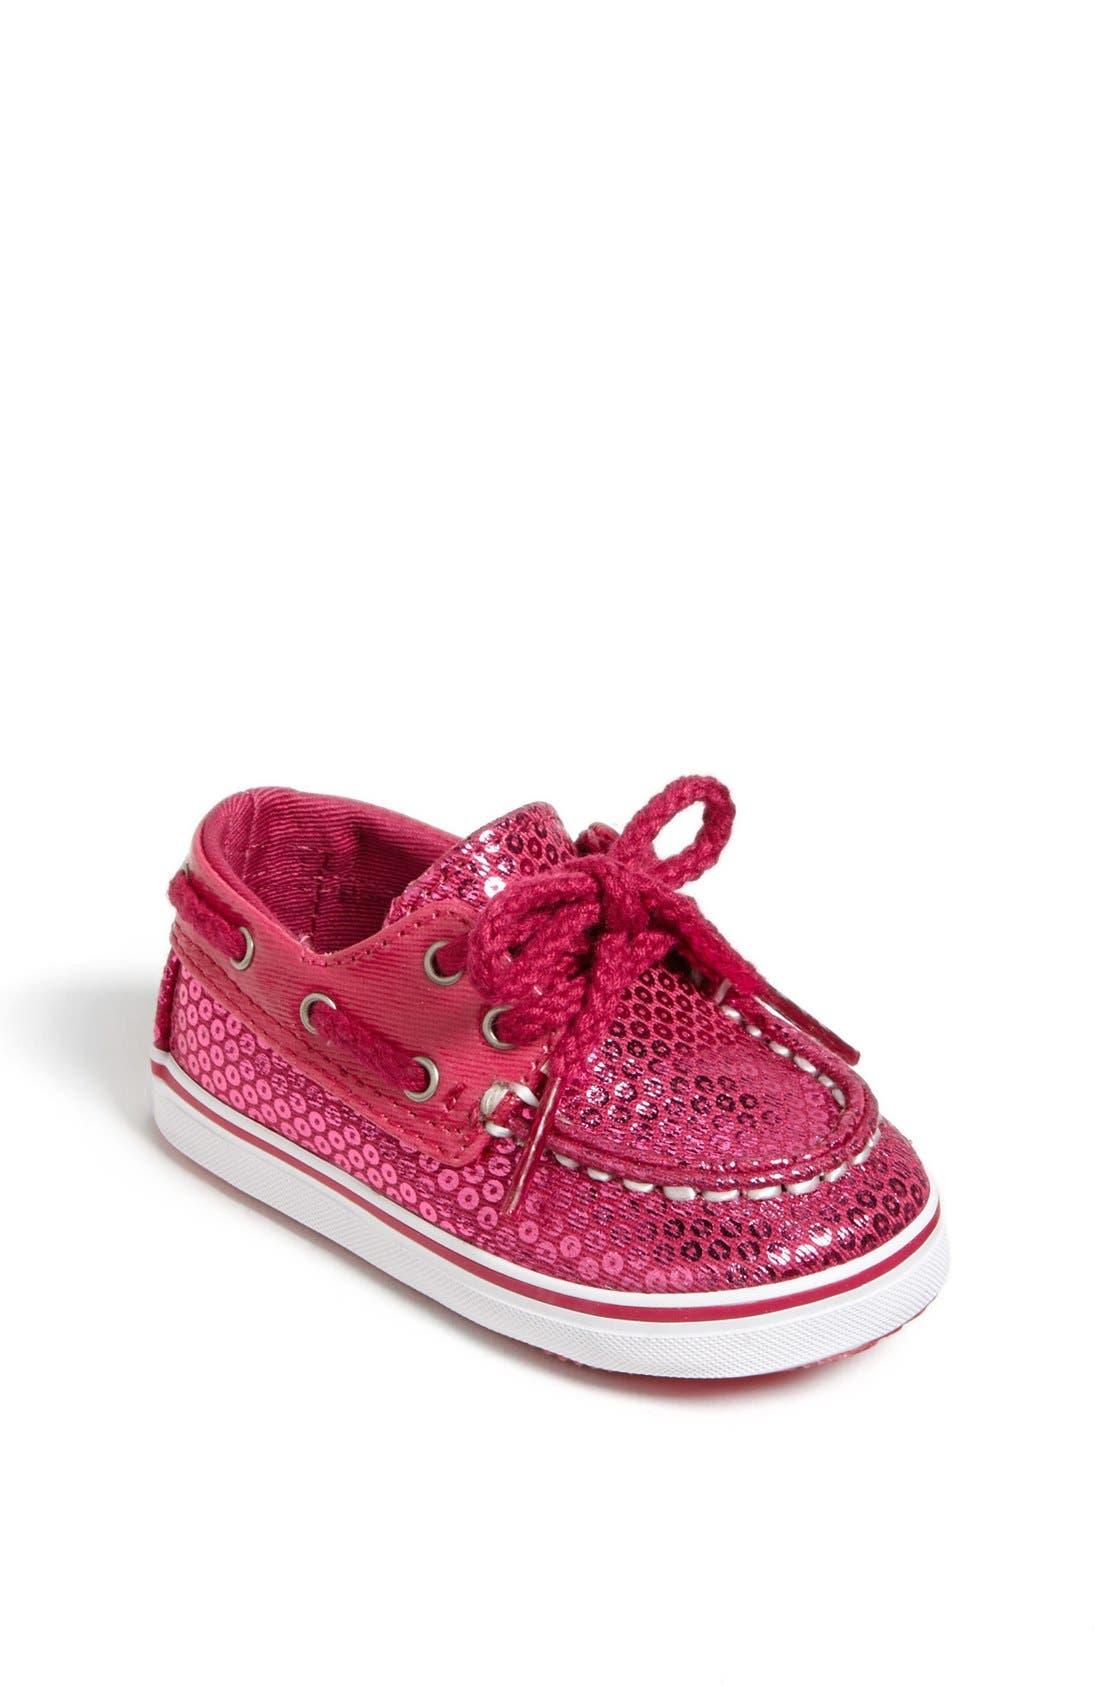 Main Image - Sperry Top-Sider® Kids 'Bahama' Crib Shoe (Baby)